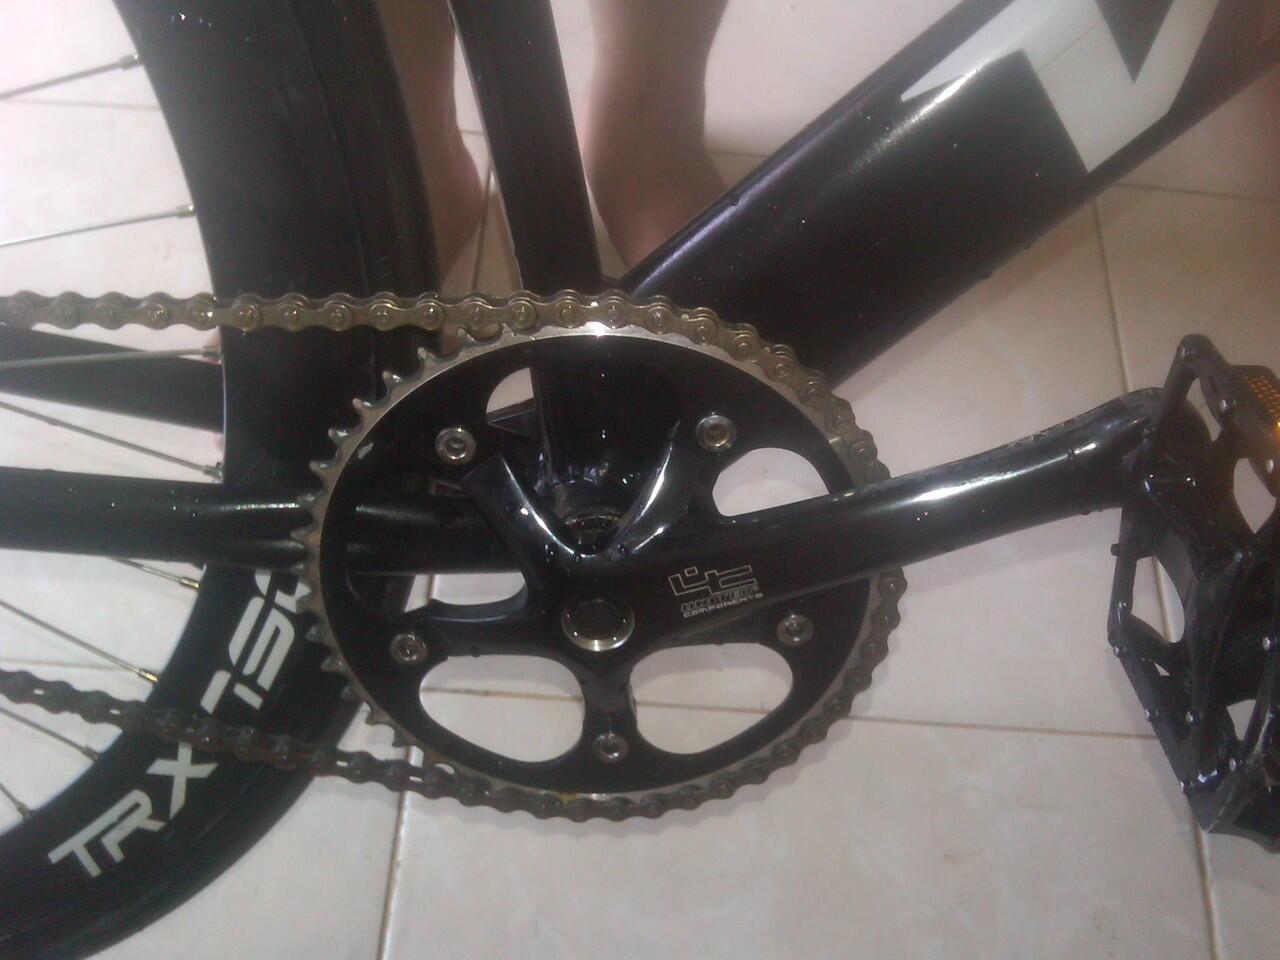 Terjual Jual Sepedah Fixie Frame Visp Custom Black Murah